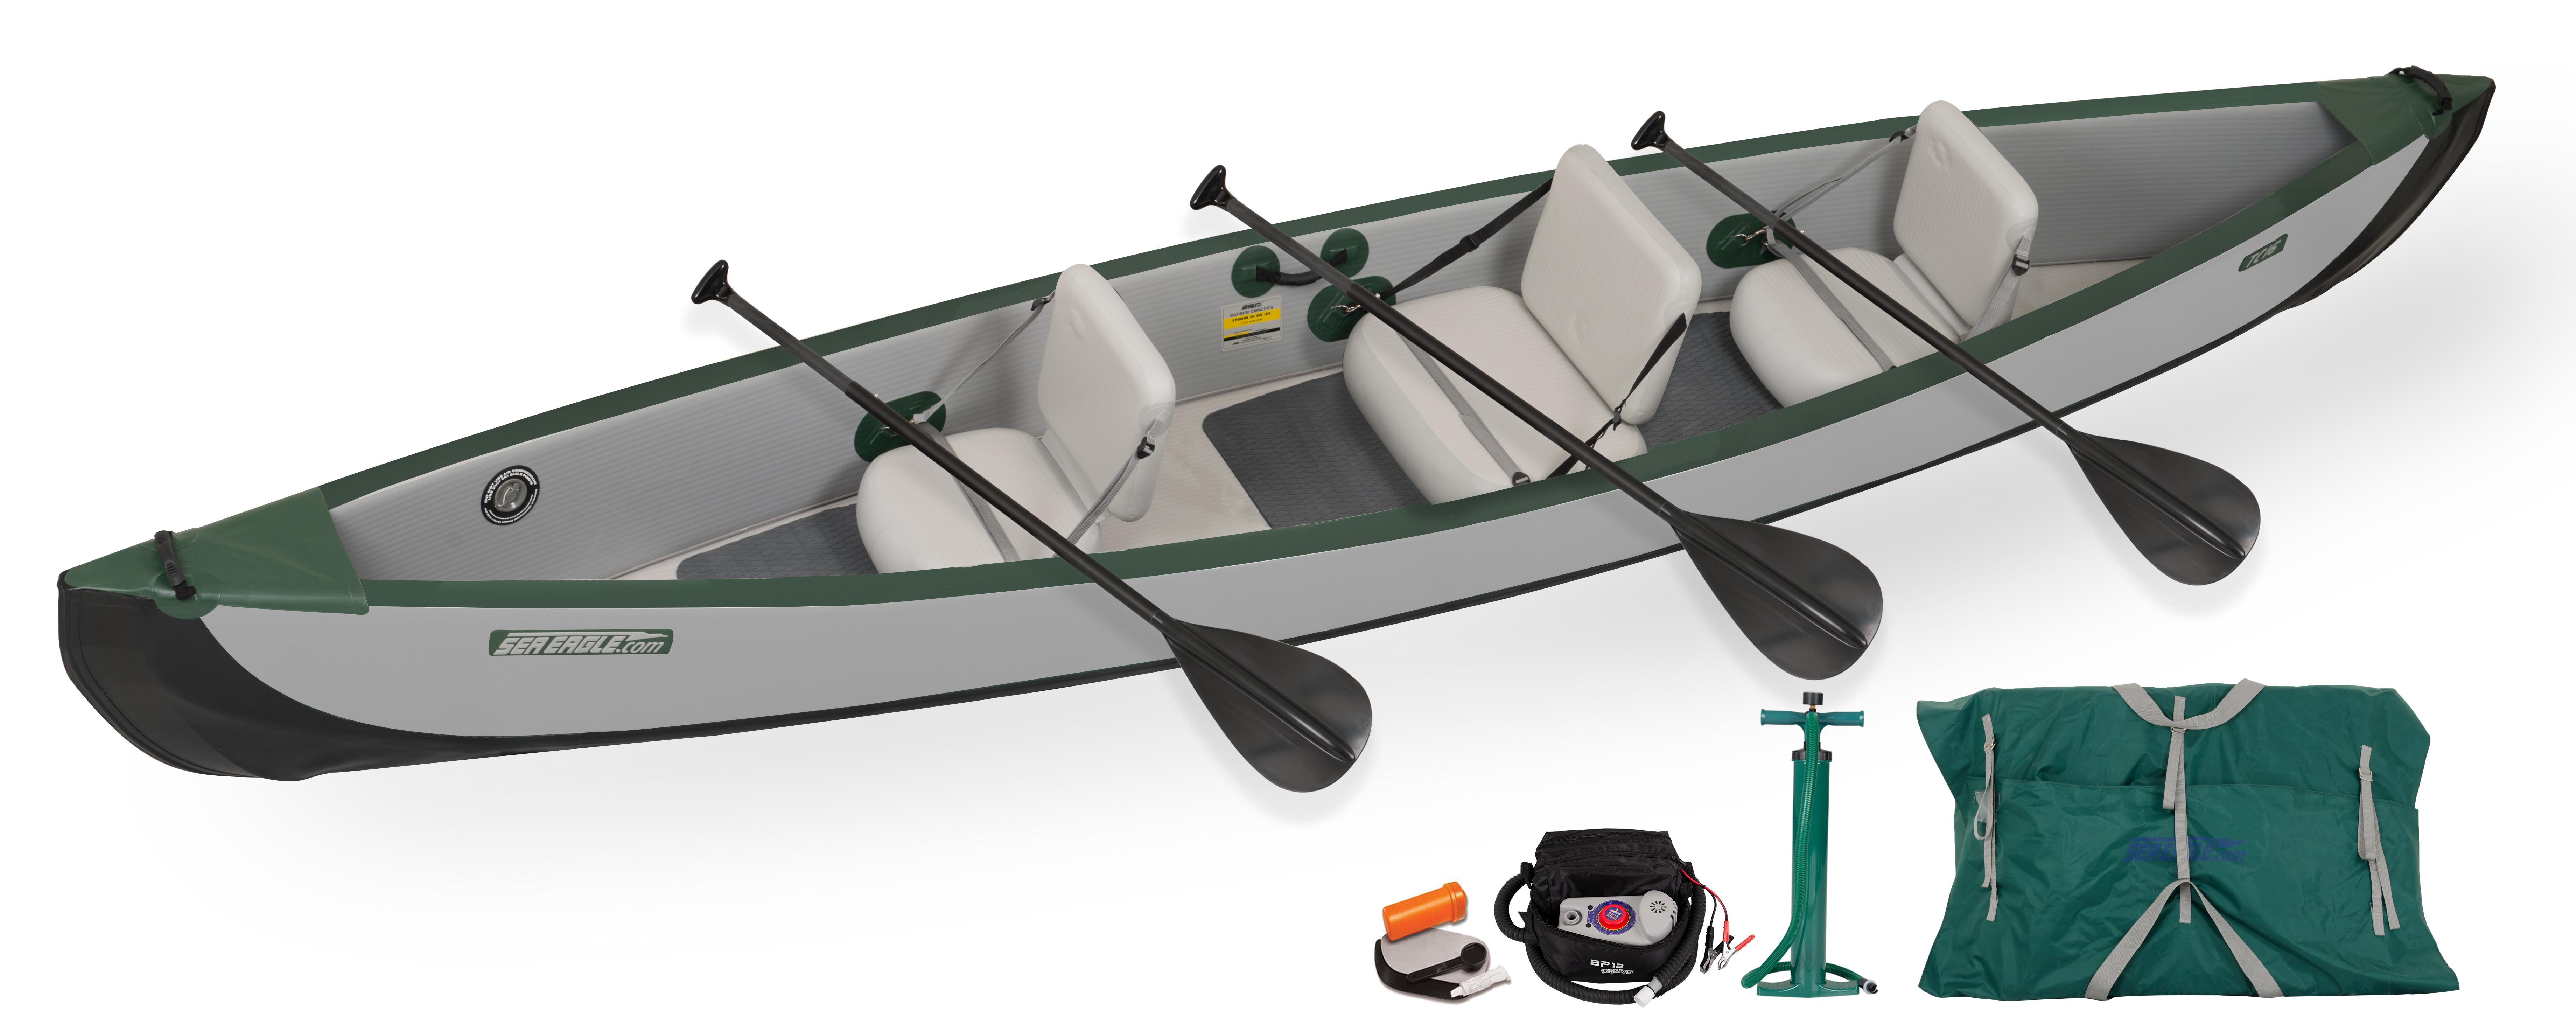 Sea Eagle TC16 Inflatable Travel Canoe 3 Person Electric Pump Package by Sea Eagle Boats, Inc.